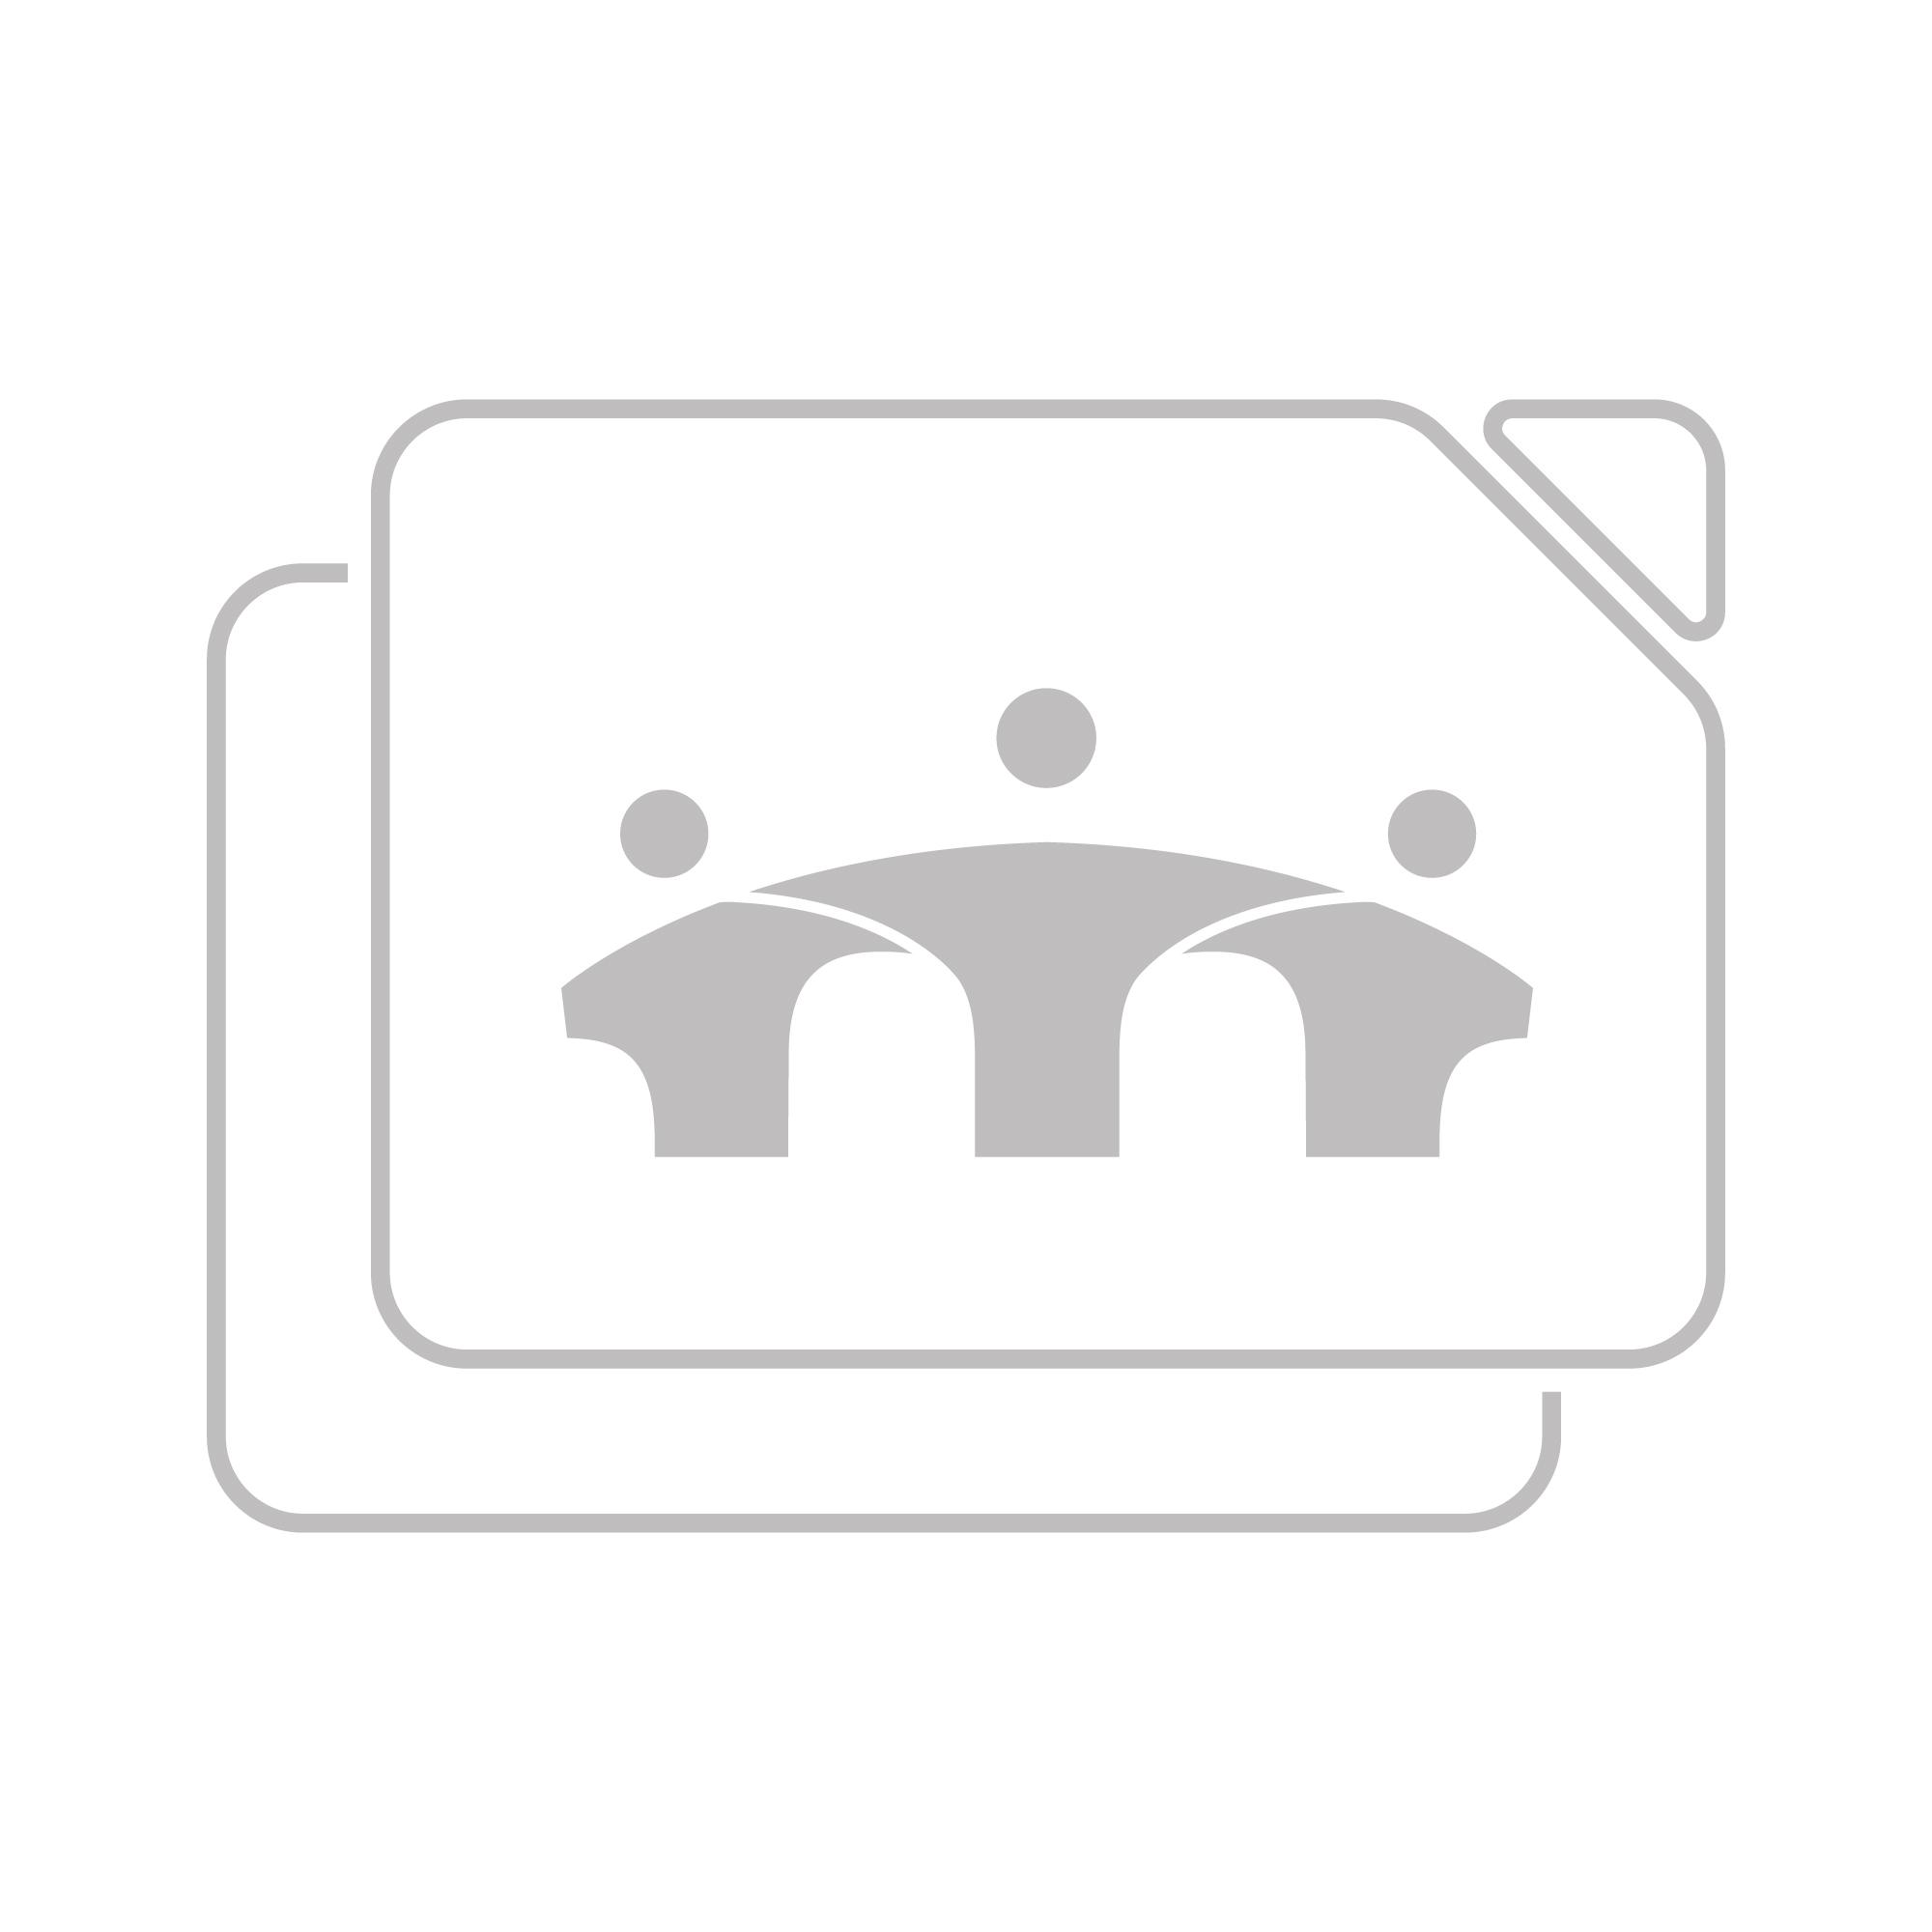 Corsair Premium Individually Sleeved PSU Cables Starter Kit Type 4 Gen 4 – Black